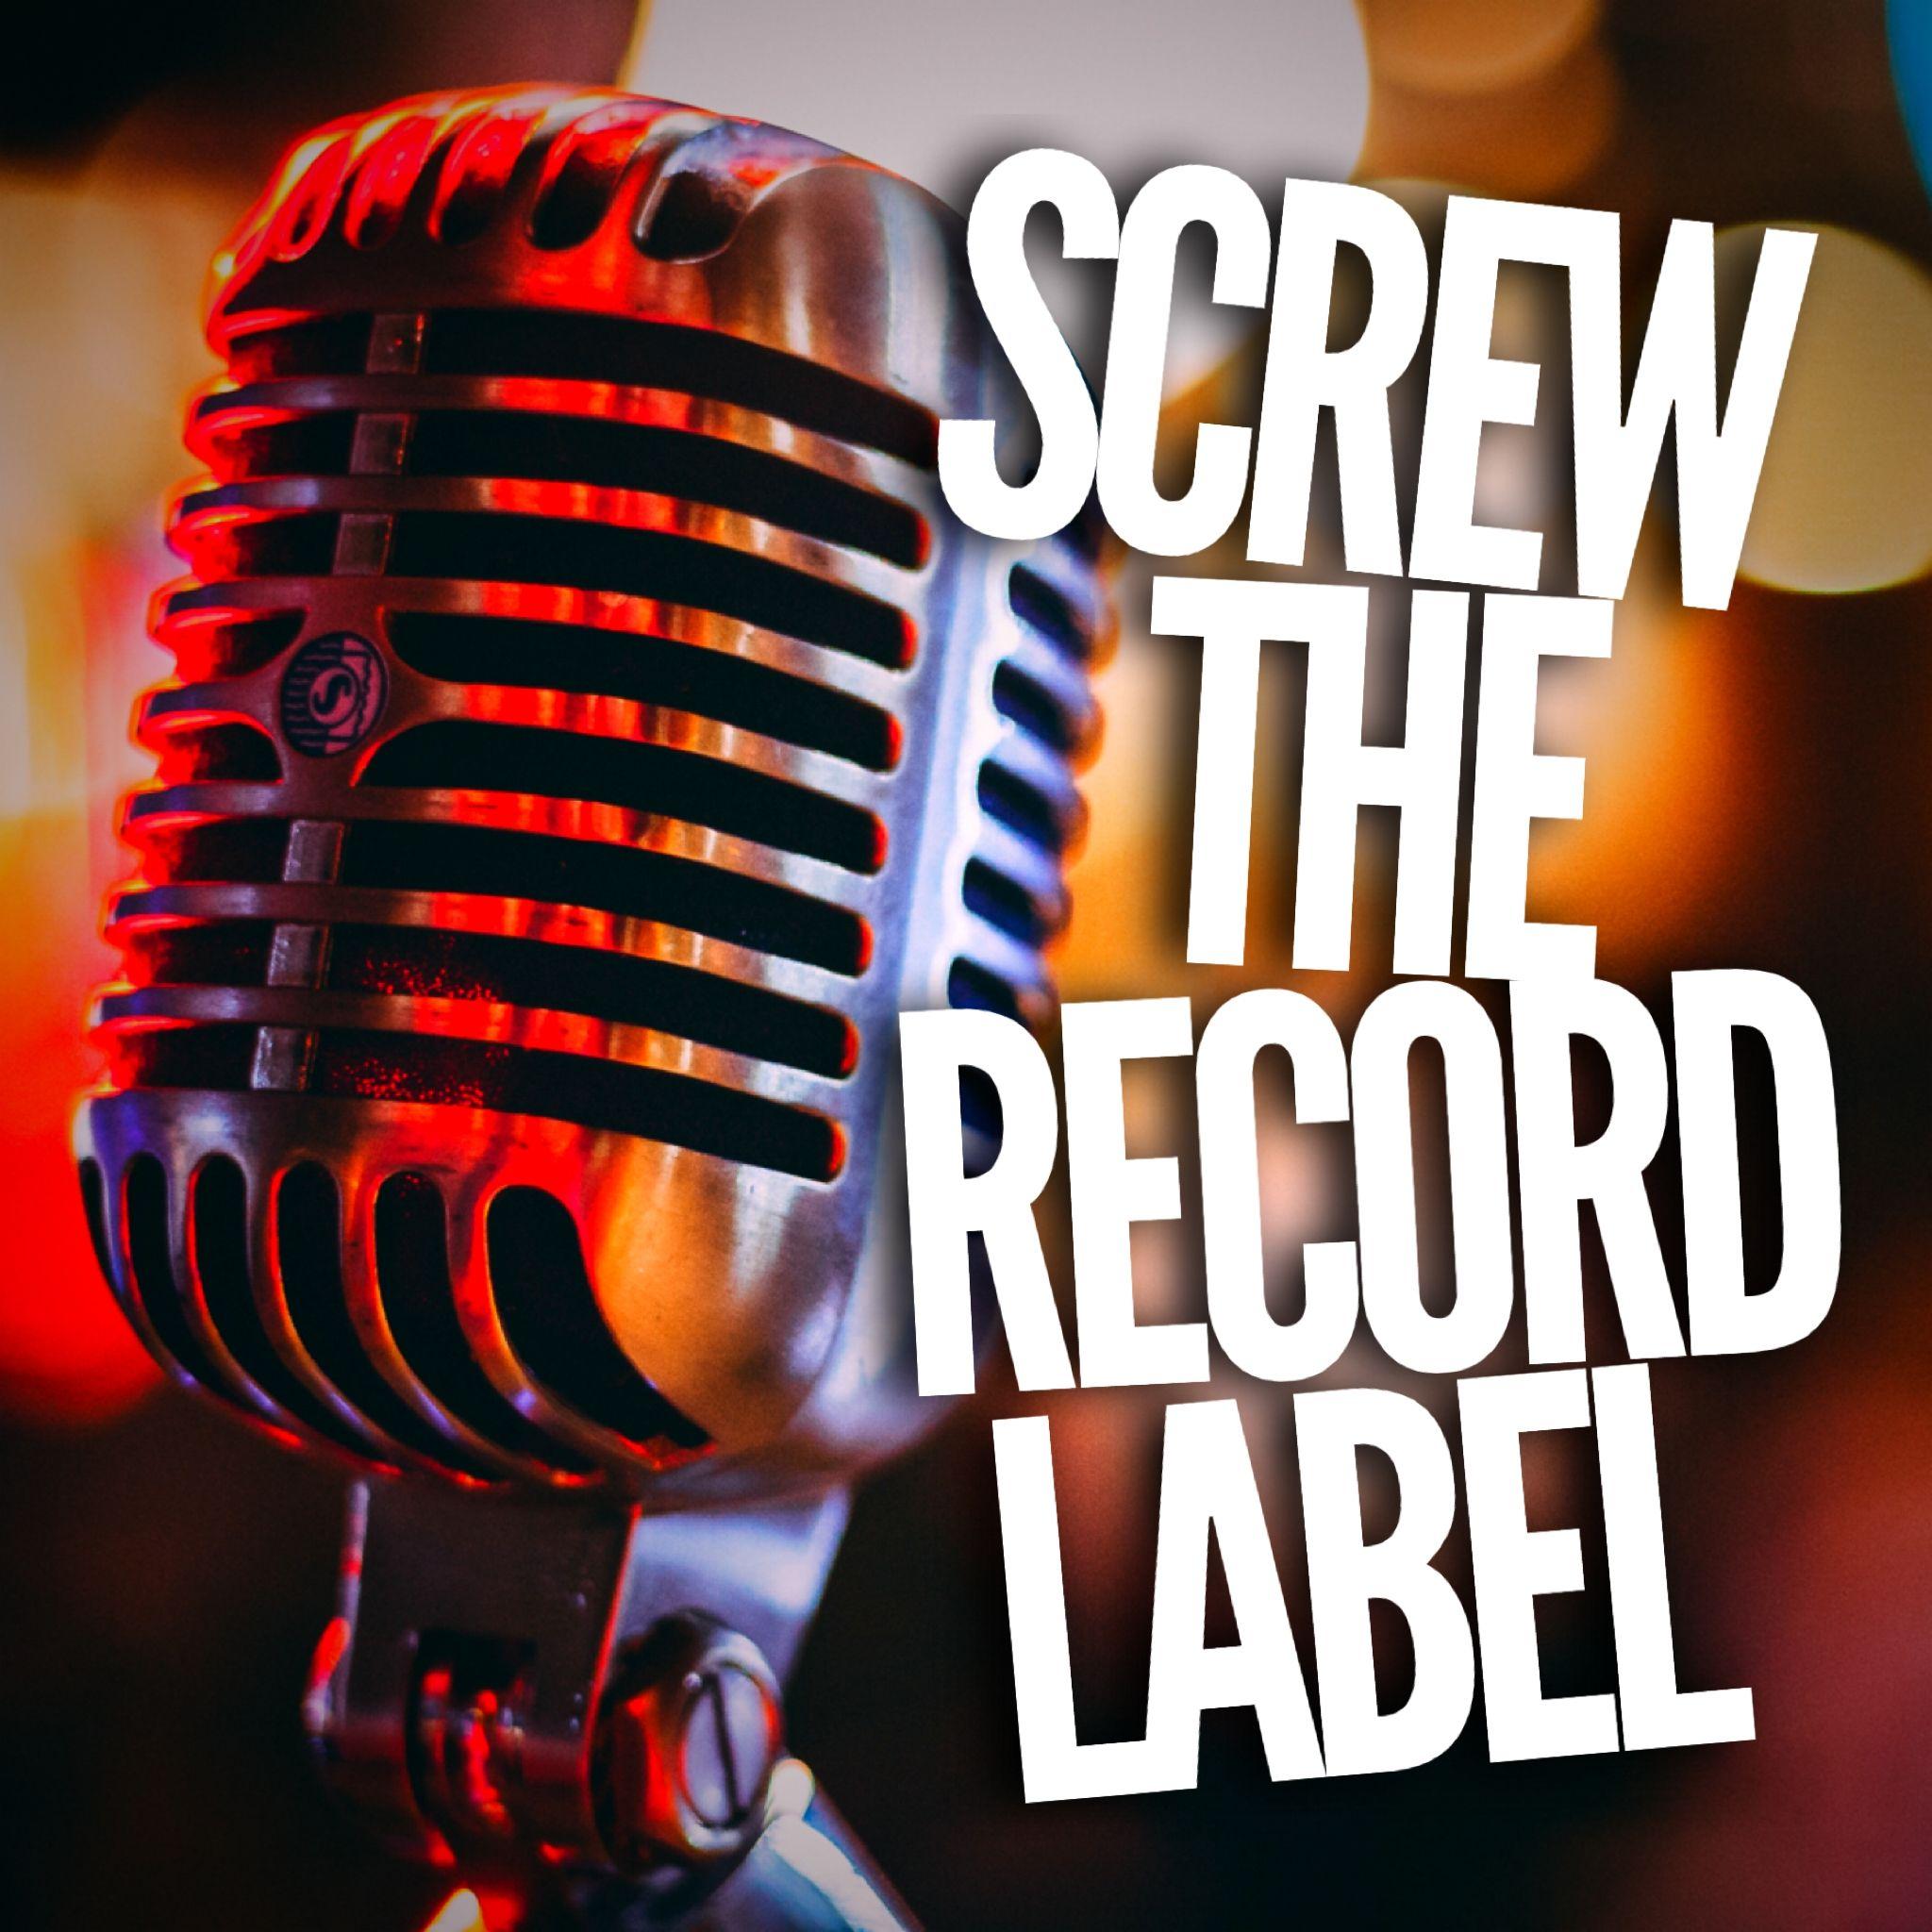 Screw The Record Label show art